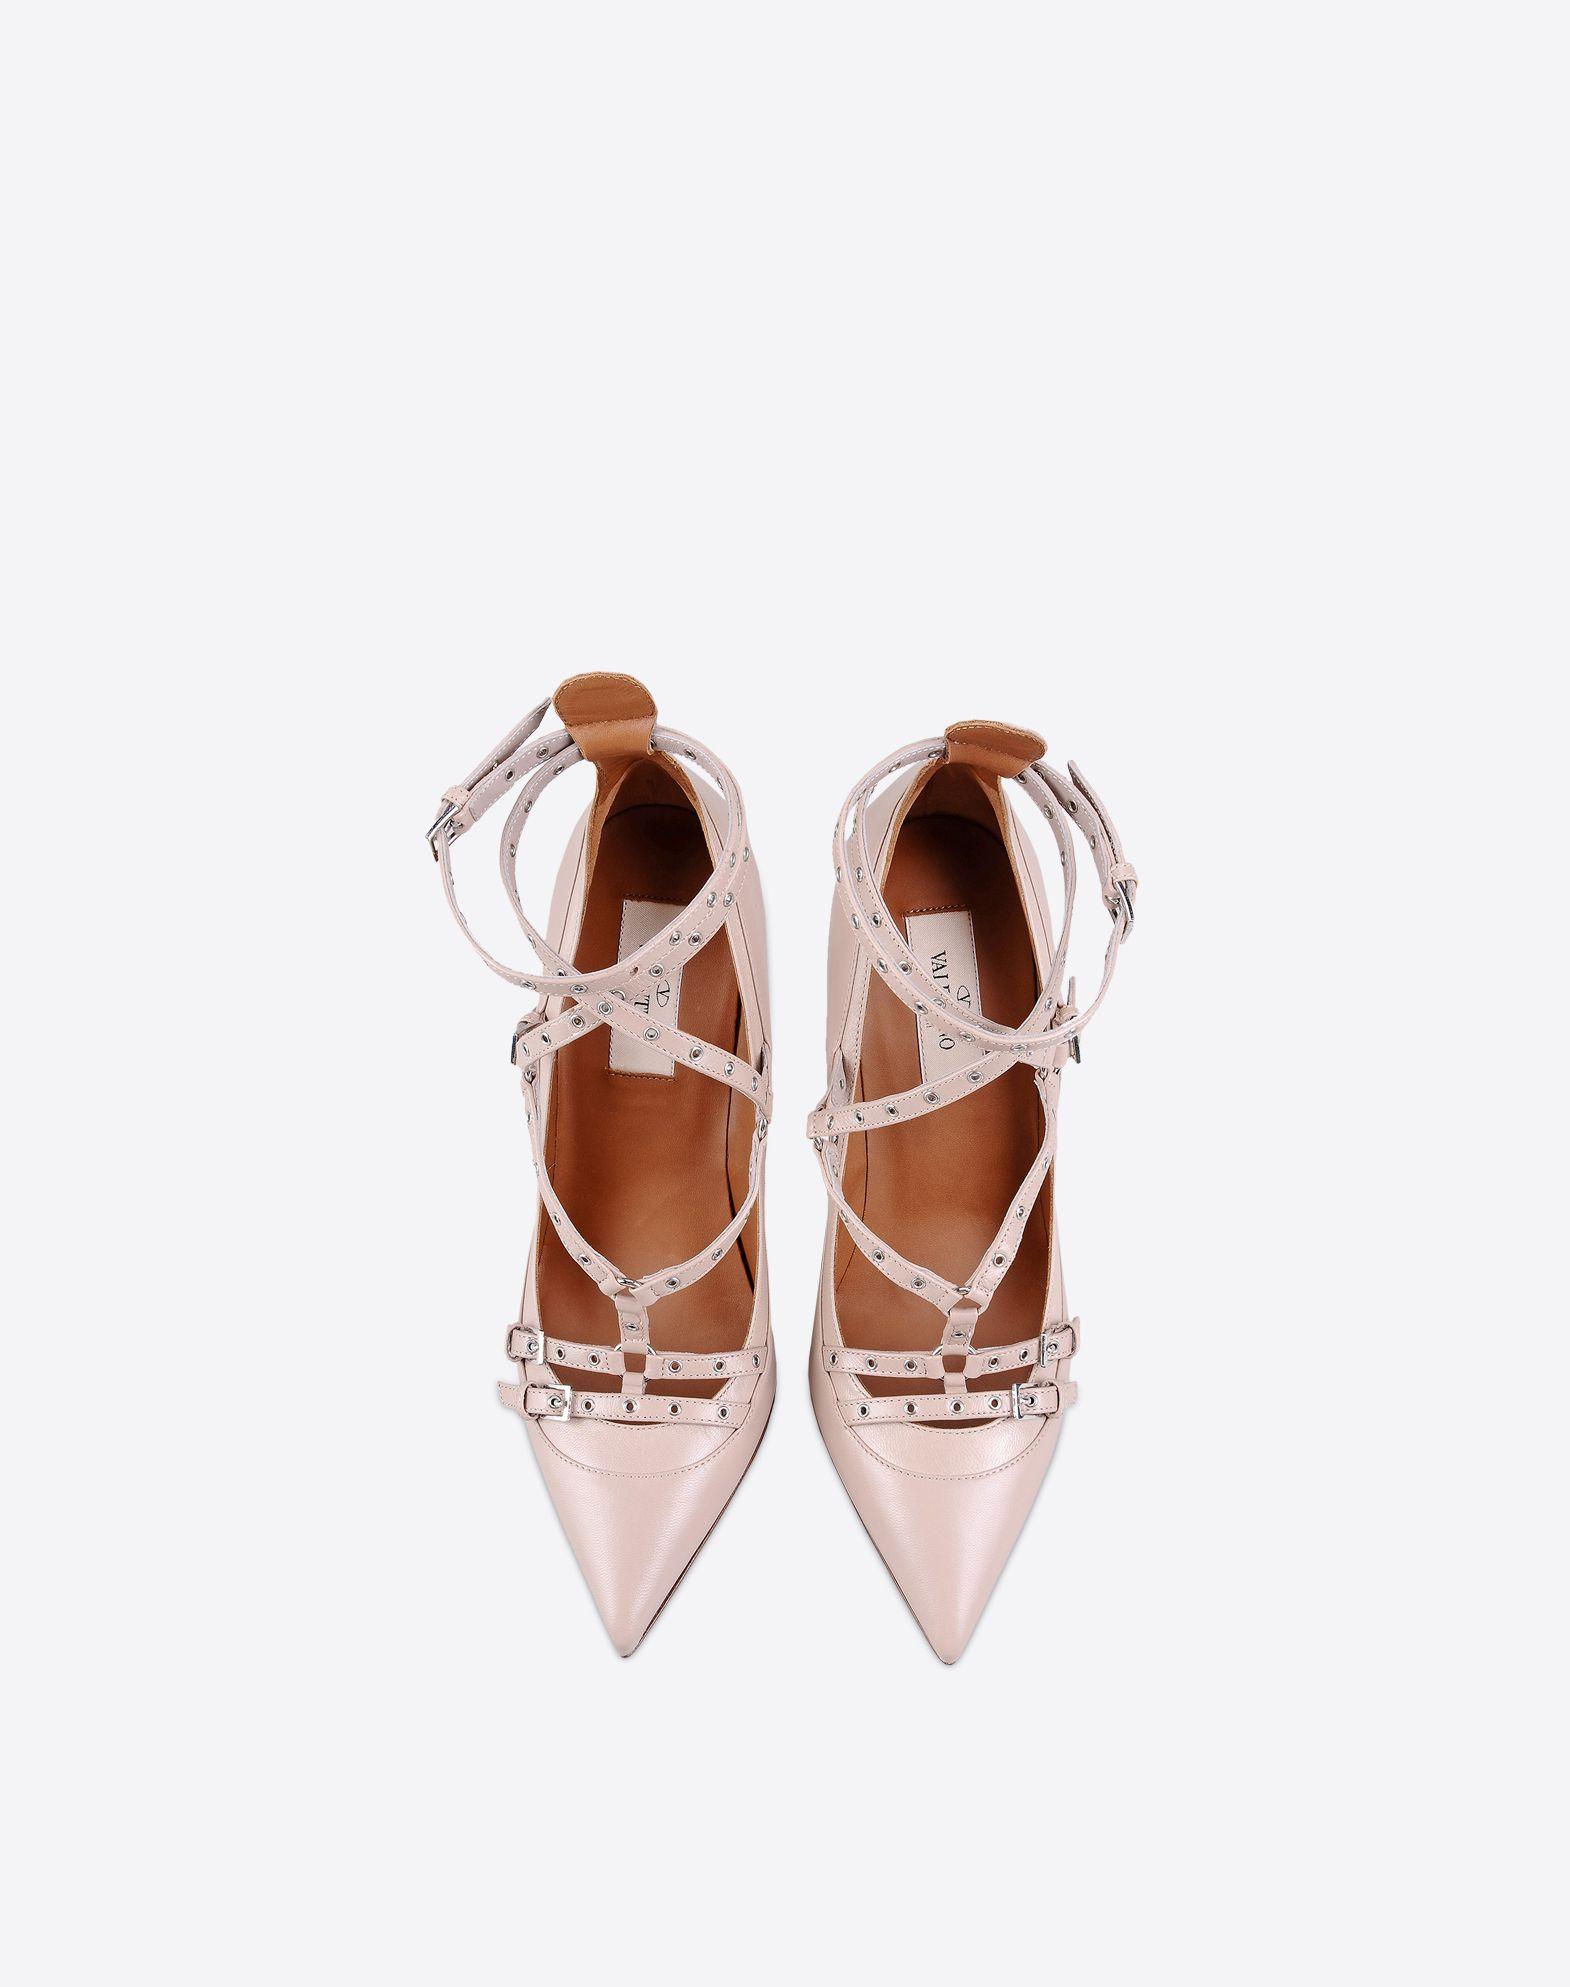 VALENTINO Studs Buckle Leather sole Narrow toeline Spike heel  44899891ii